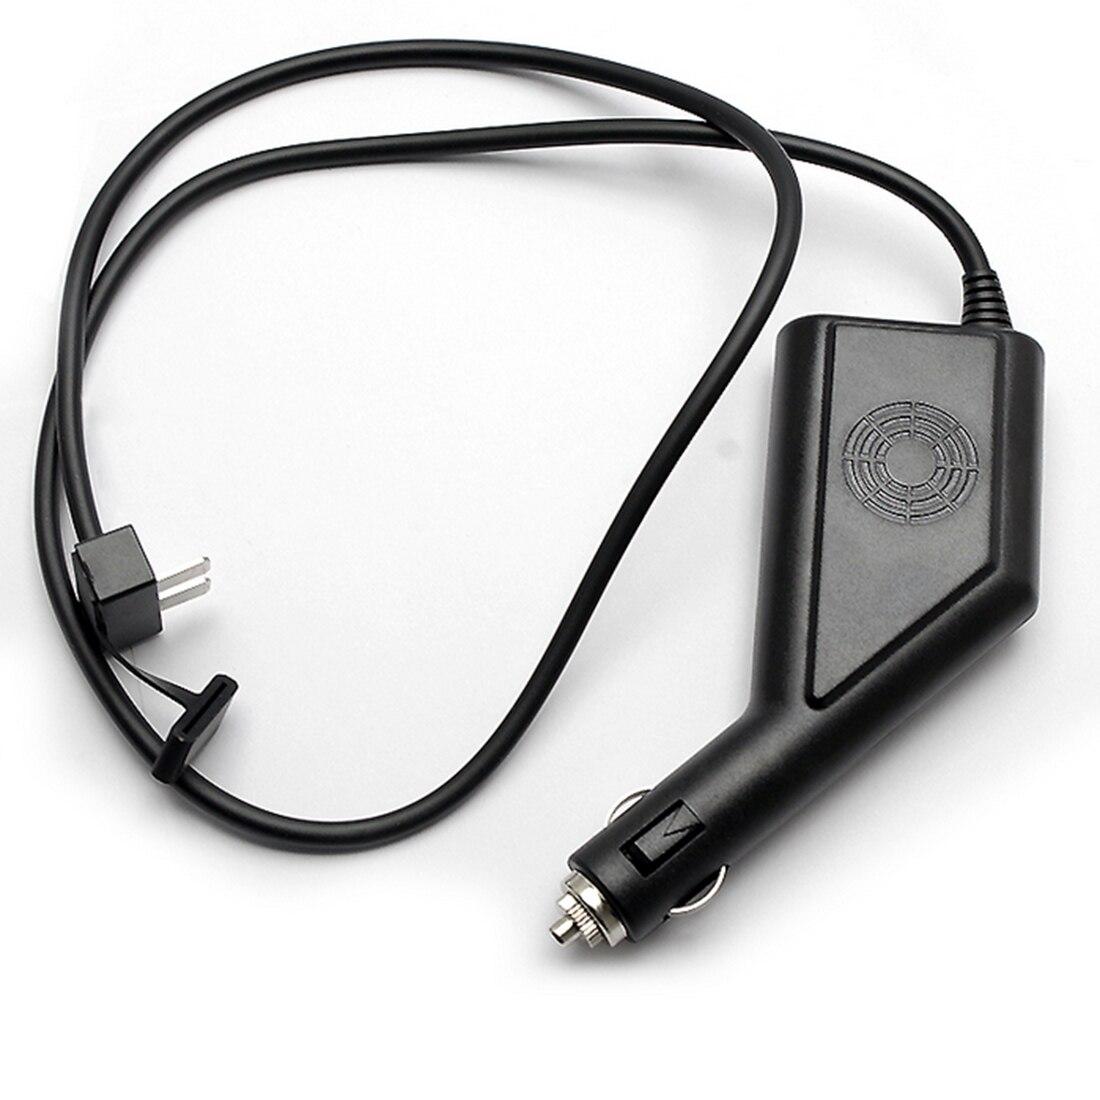 Зарядное устройство для автомобиля для бпла dji защита моторов для беспилотника dji